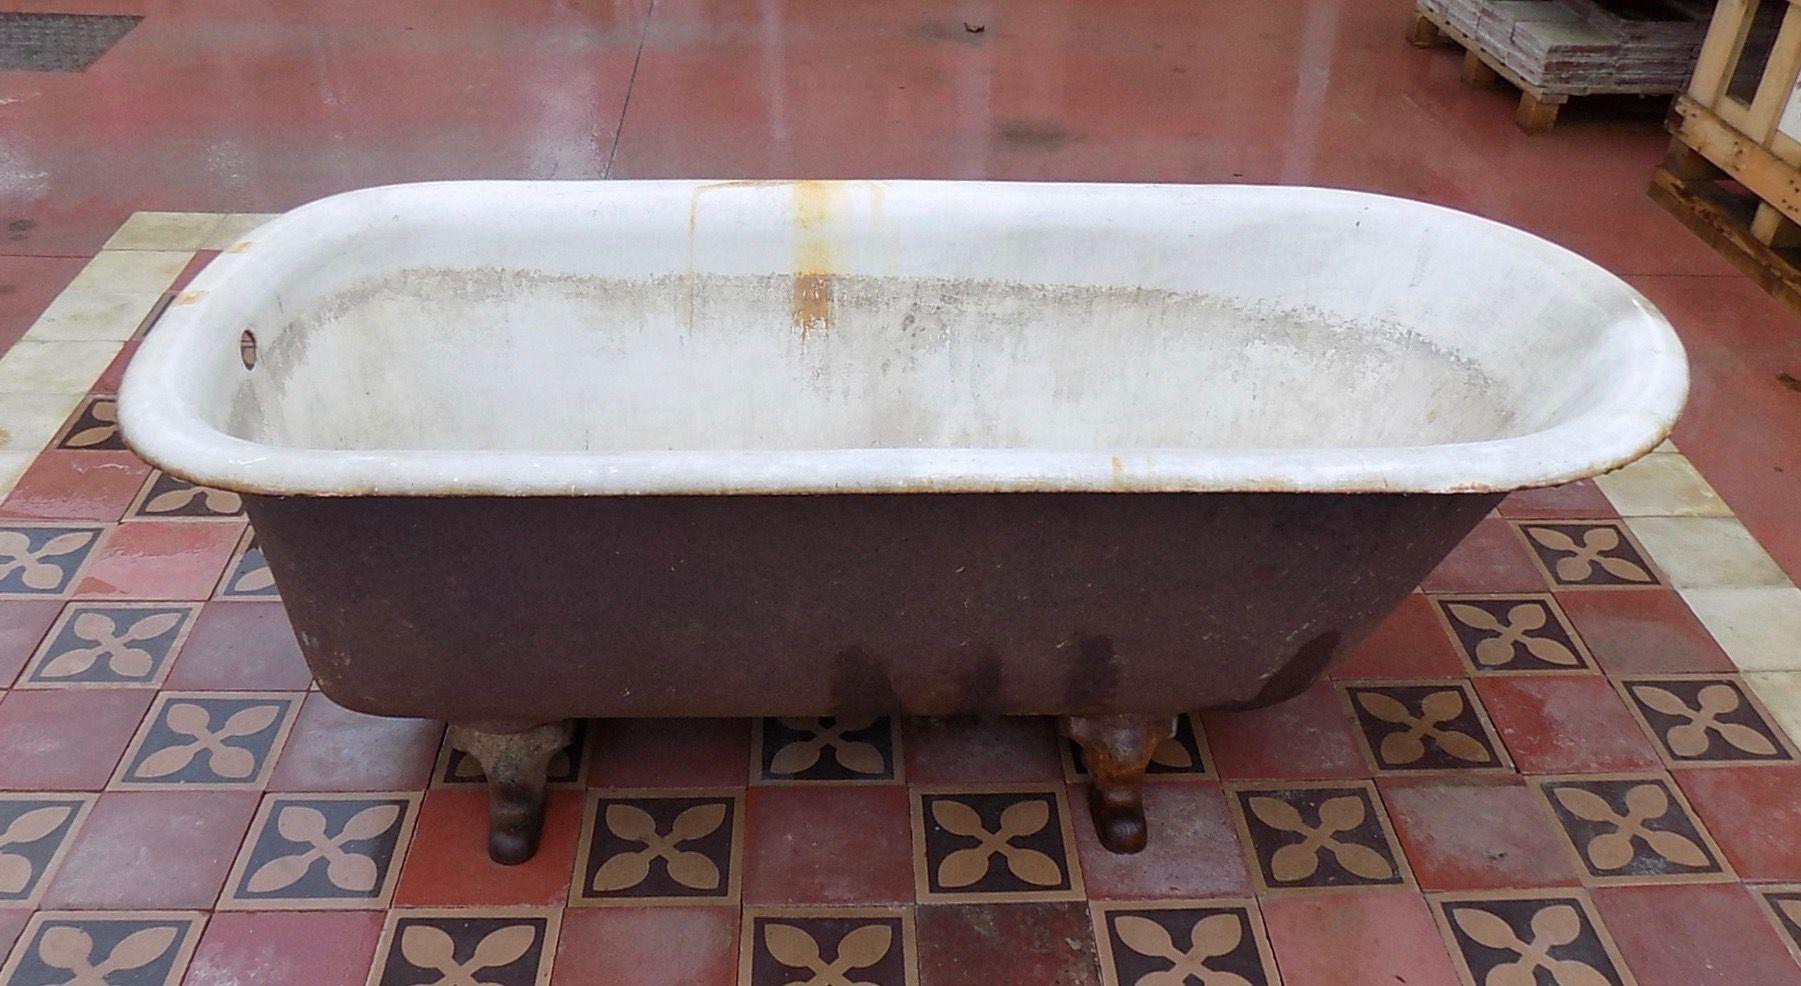 Vasca Da Bagno Lamiera : Vasche da bagno panoramica su tipi e materiali